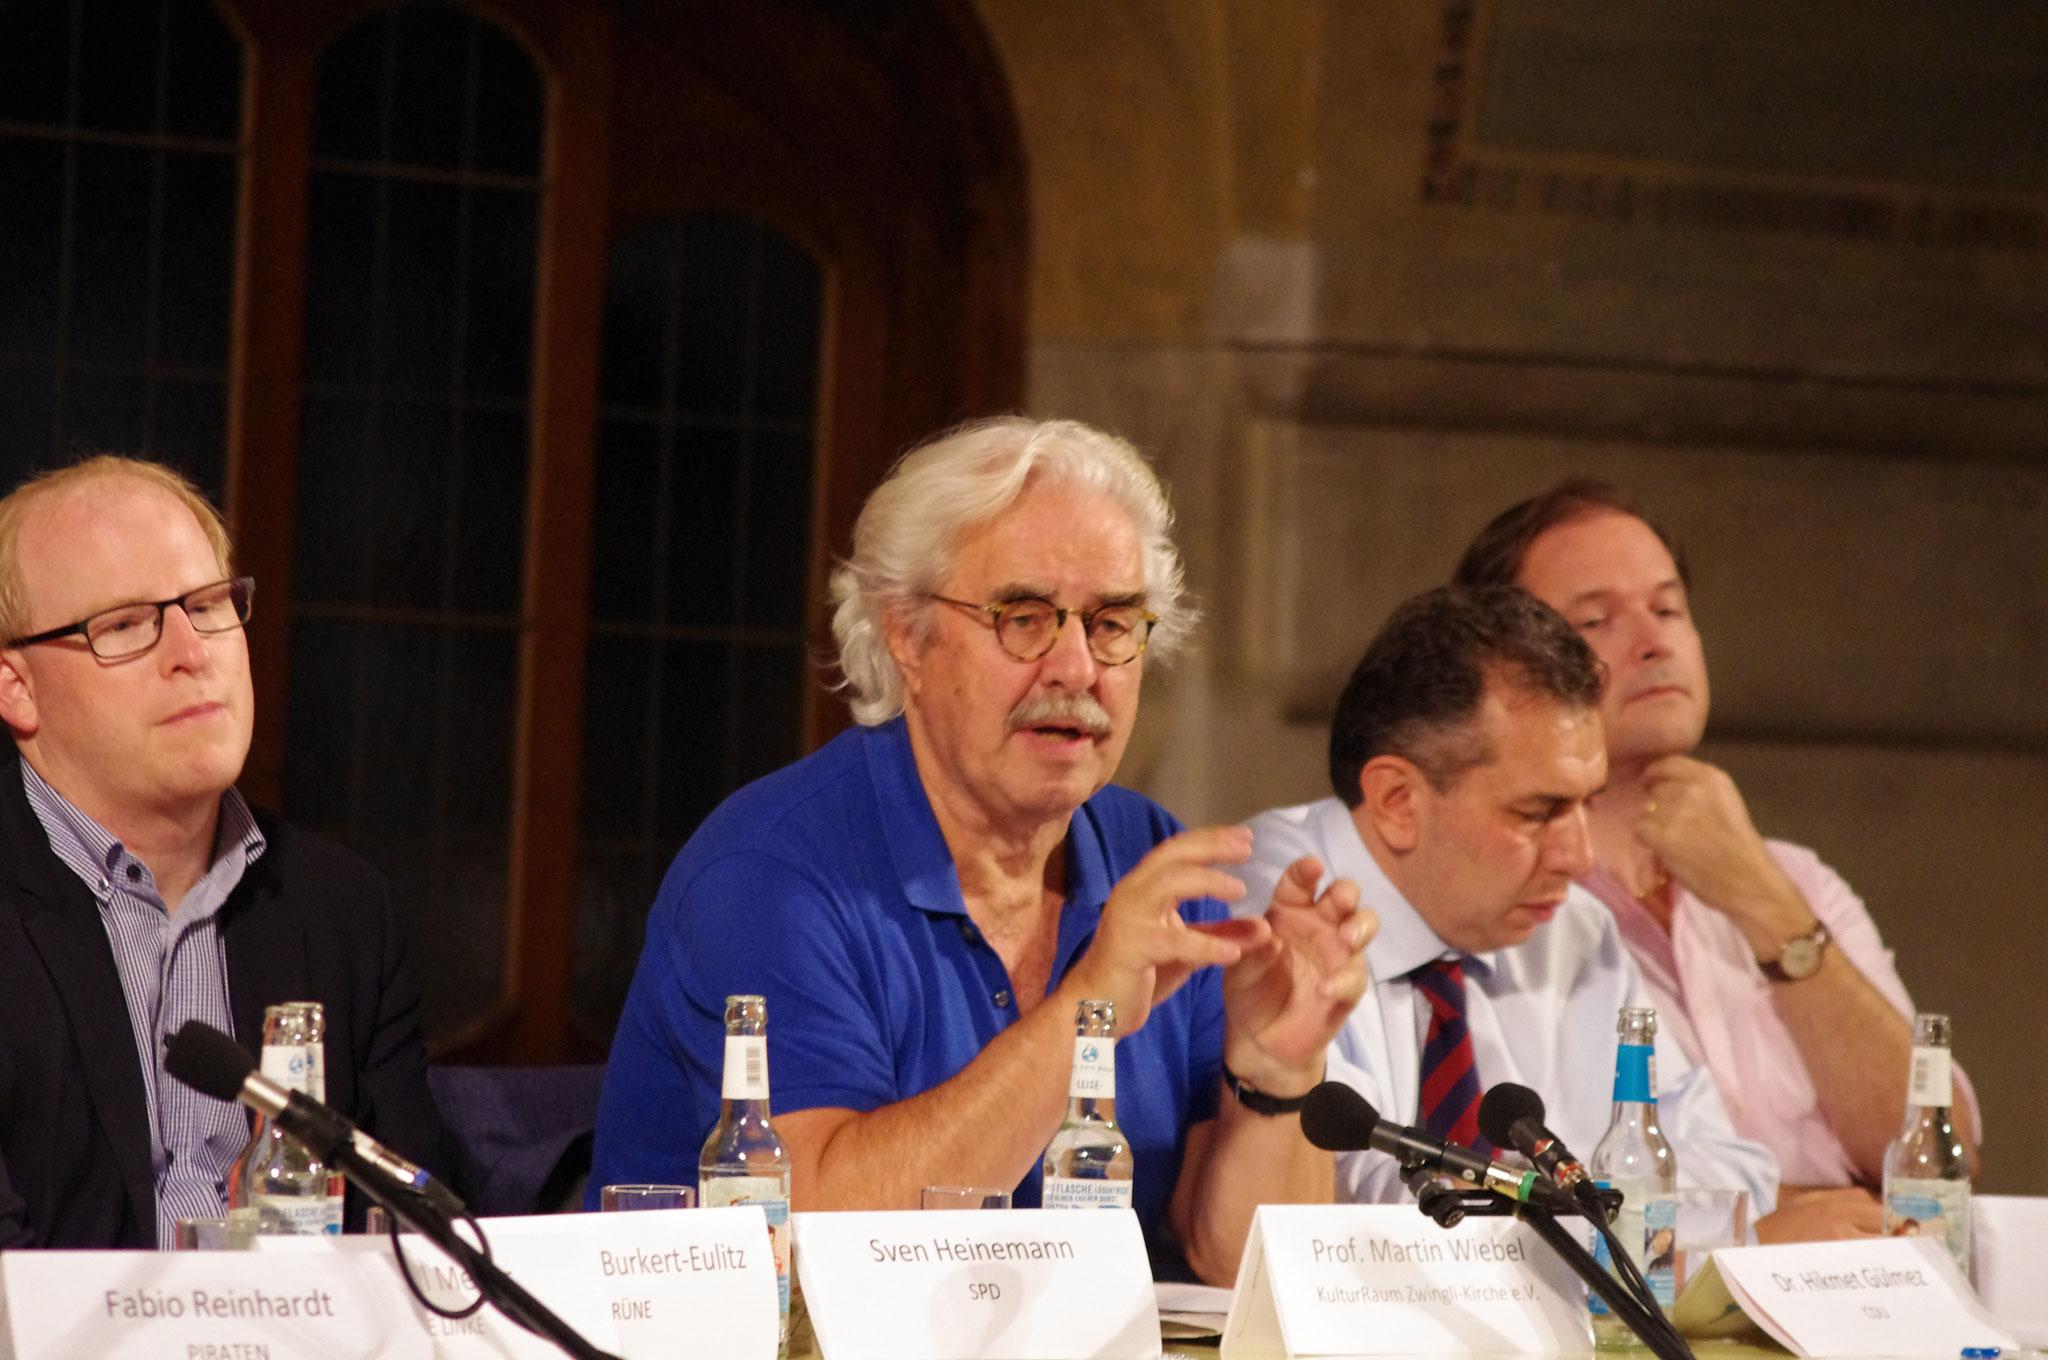 Moderator Prof. Martin Wiebel